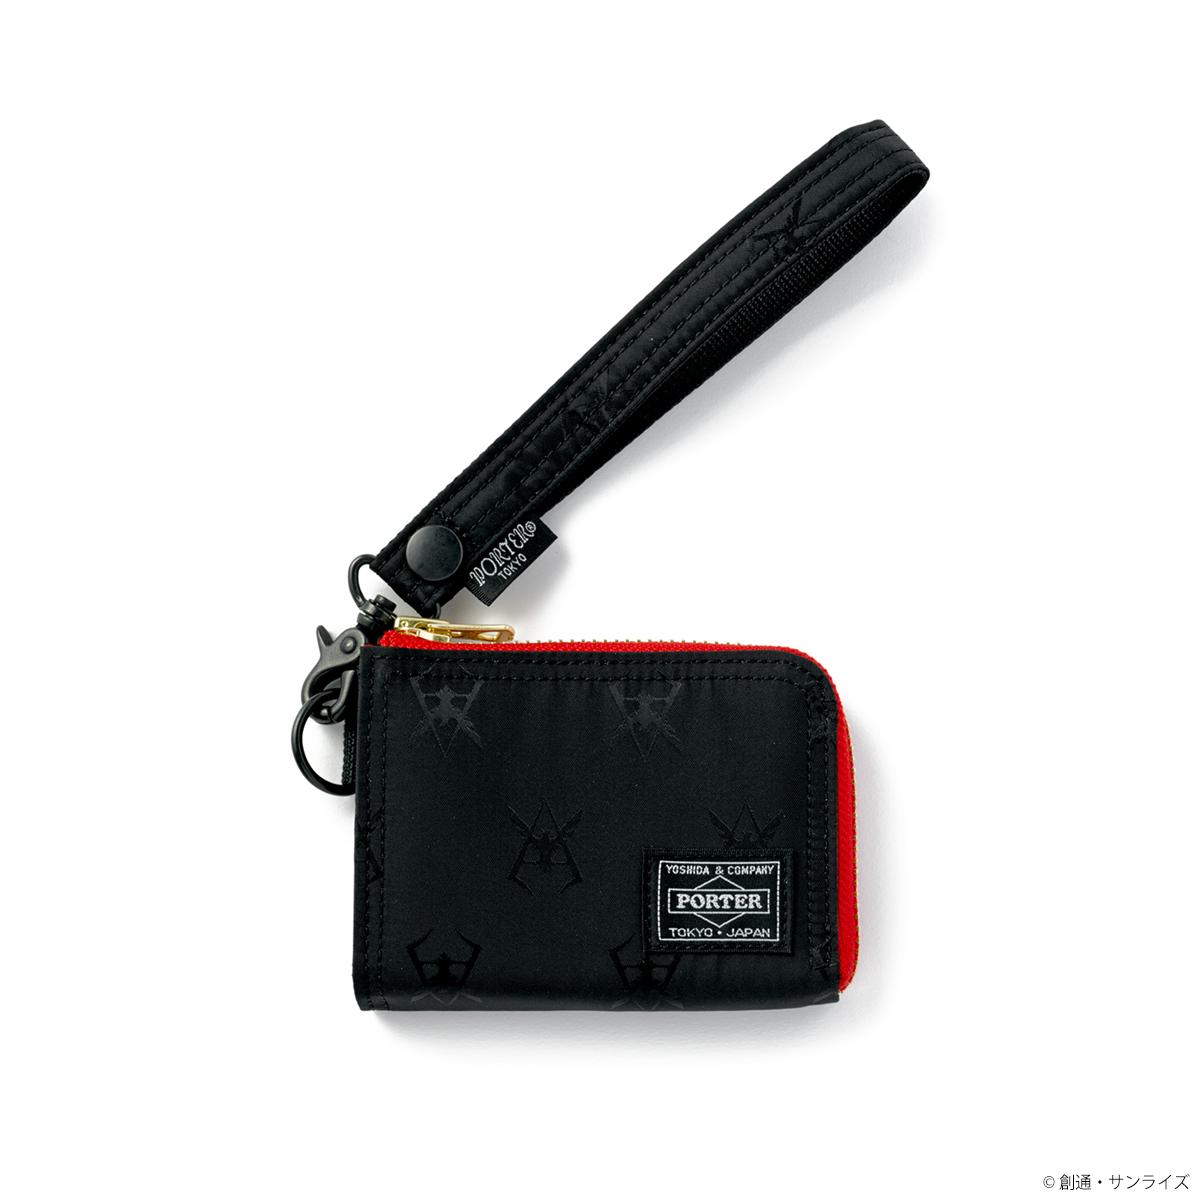 [Wallet] PORTER TOKYO JAPAN Wallet RED COMET